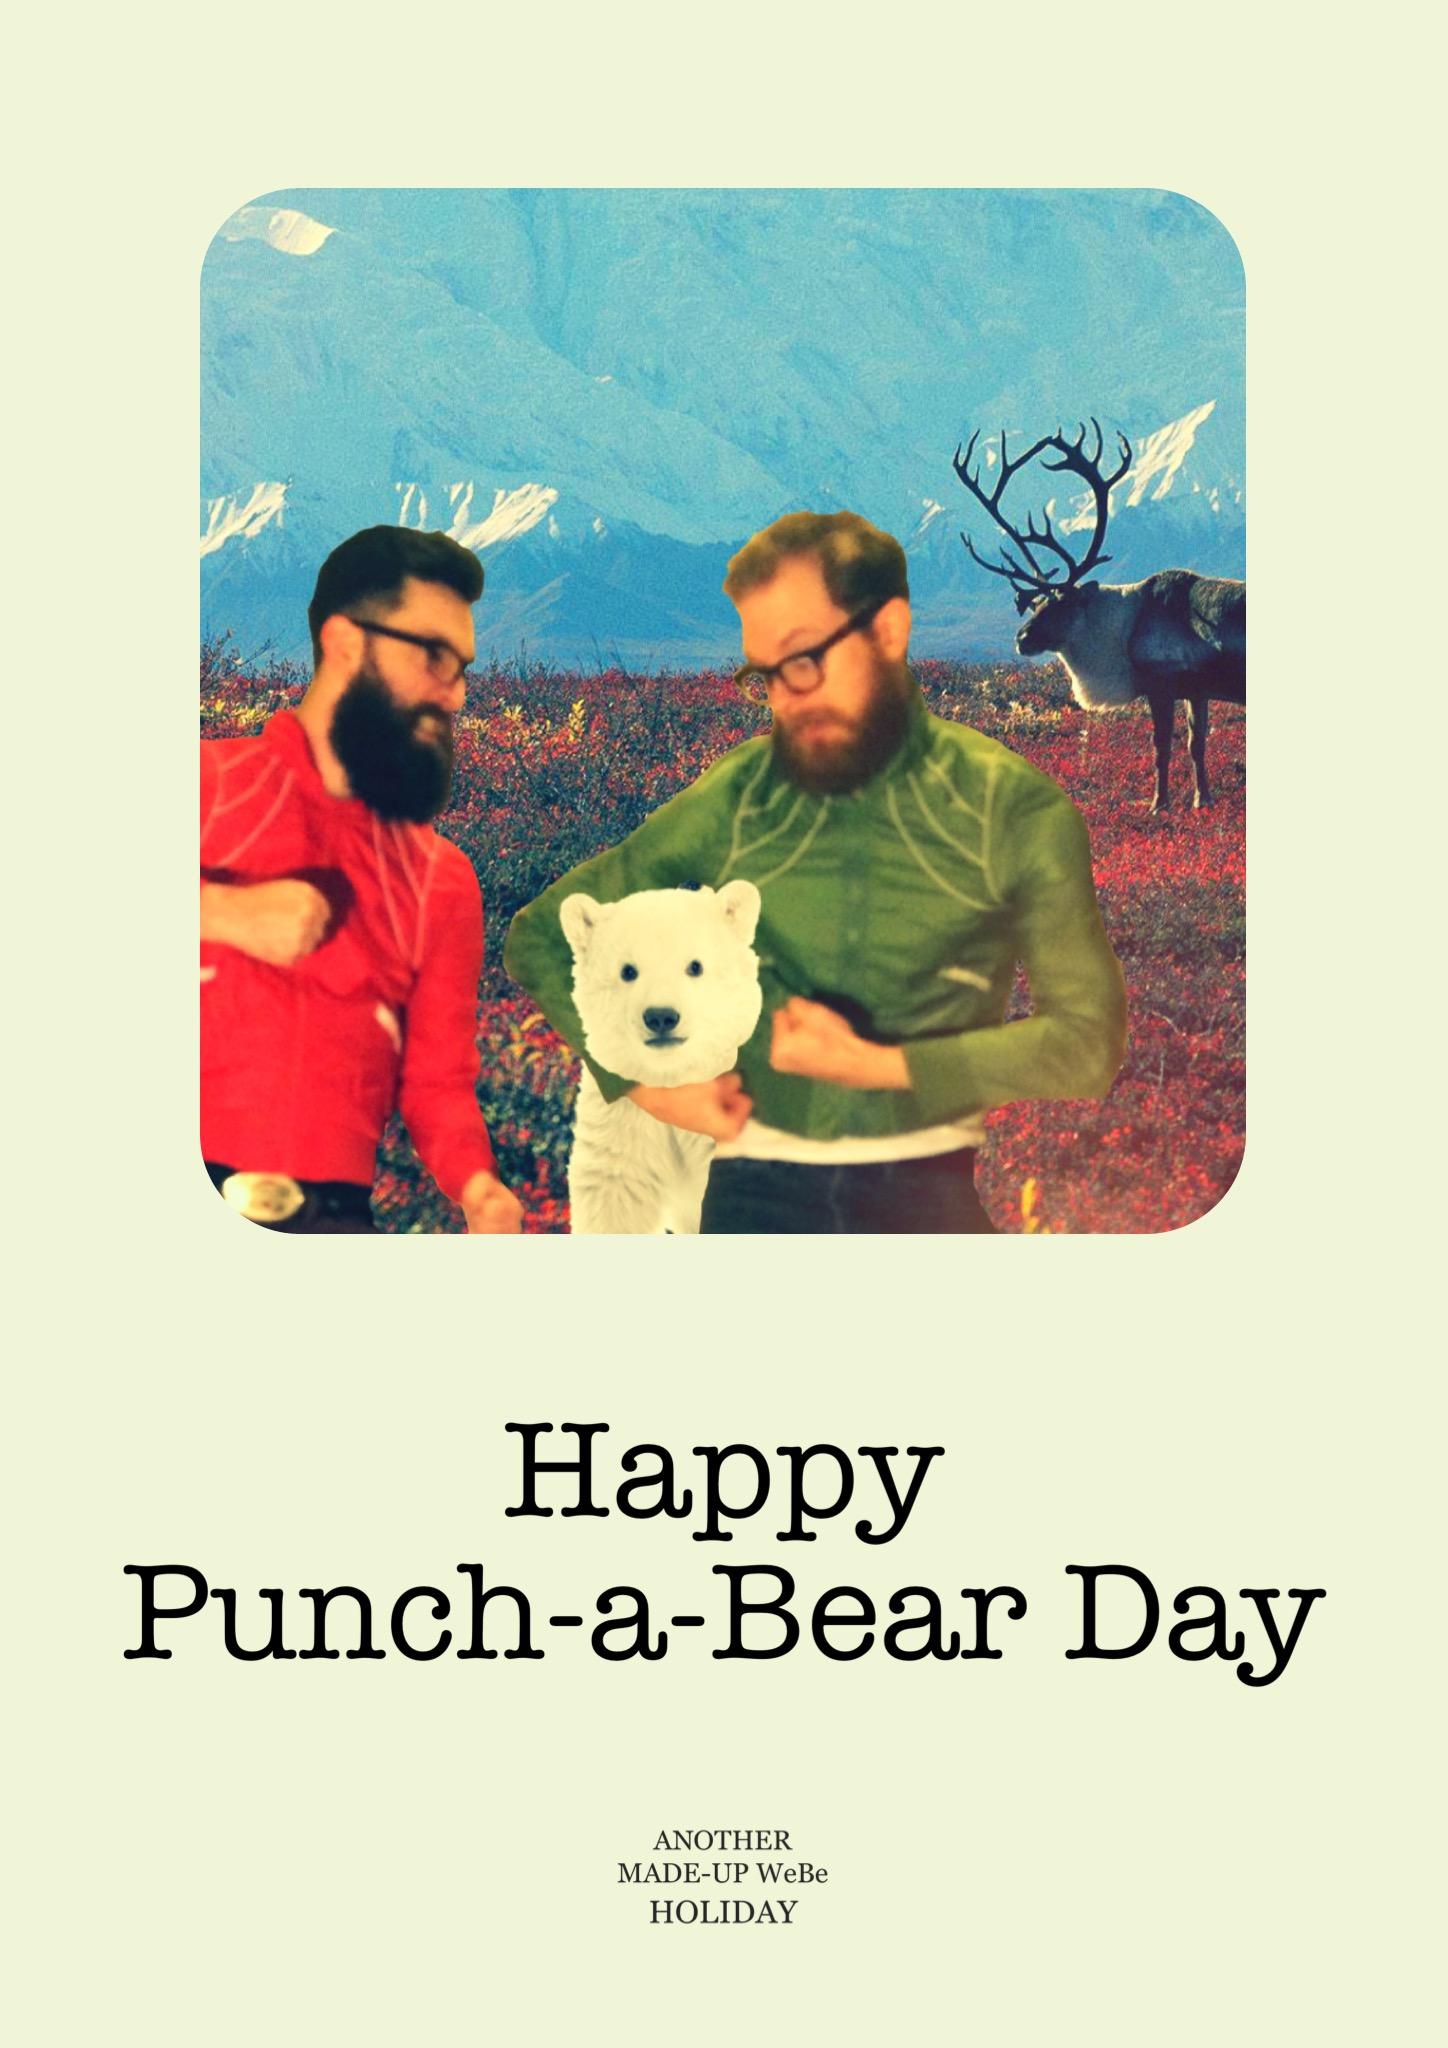 Punch-a-Bear Day 2014 - WeBe 01.jpg